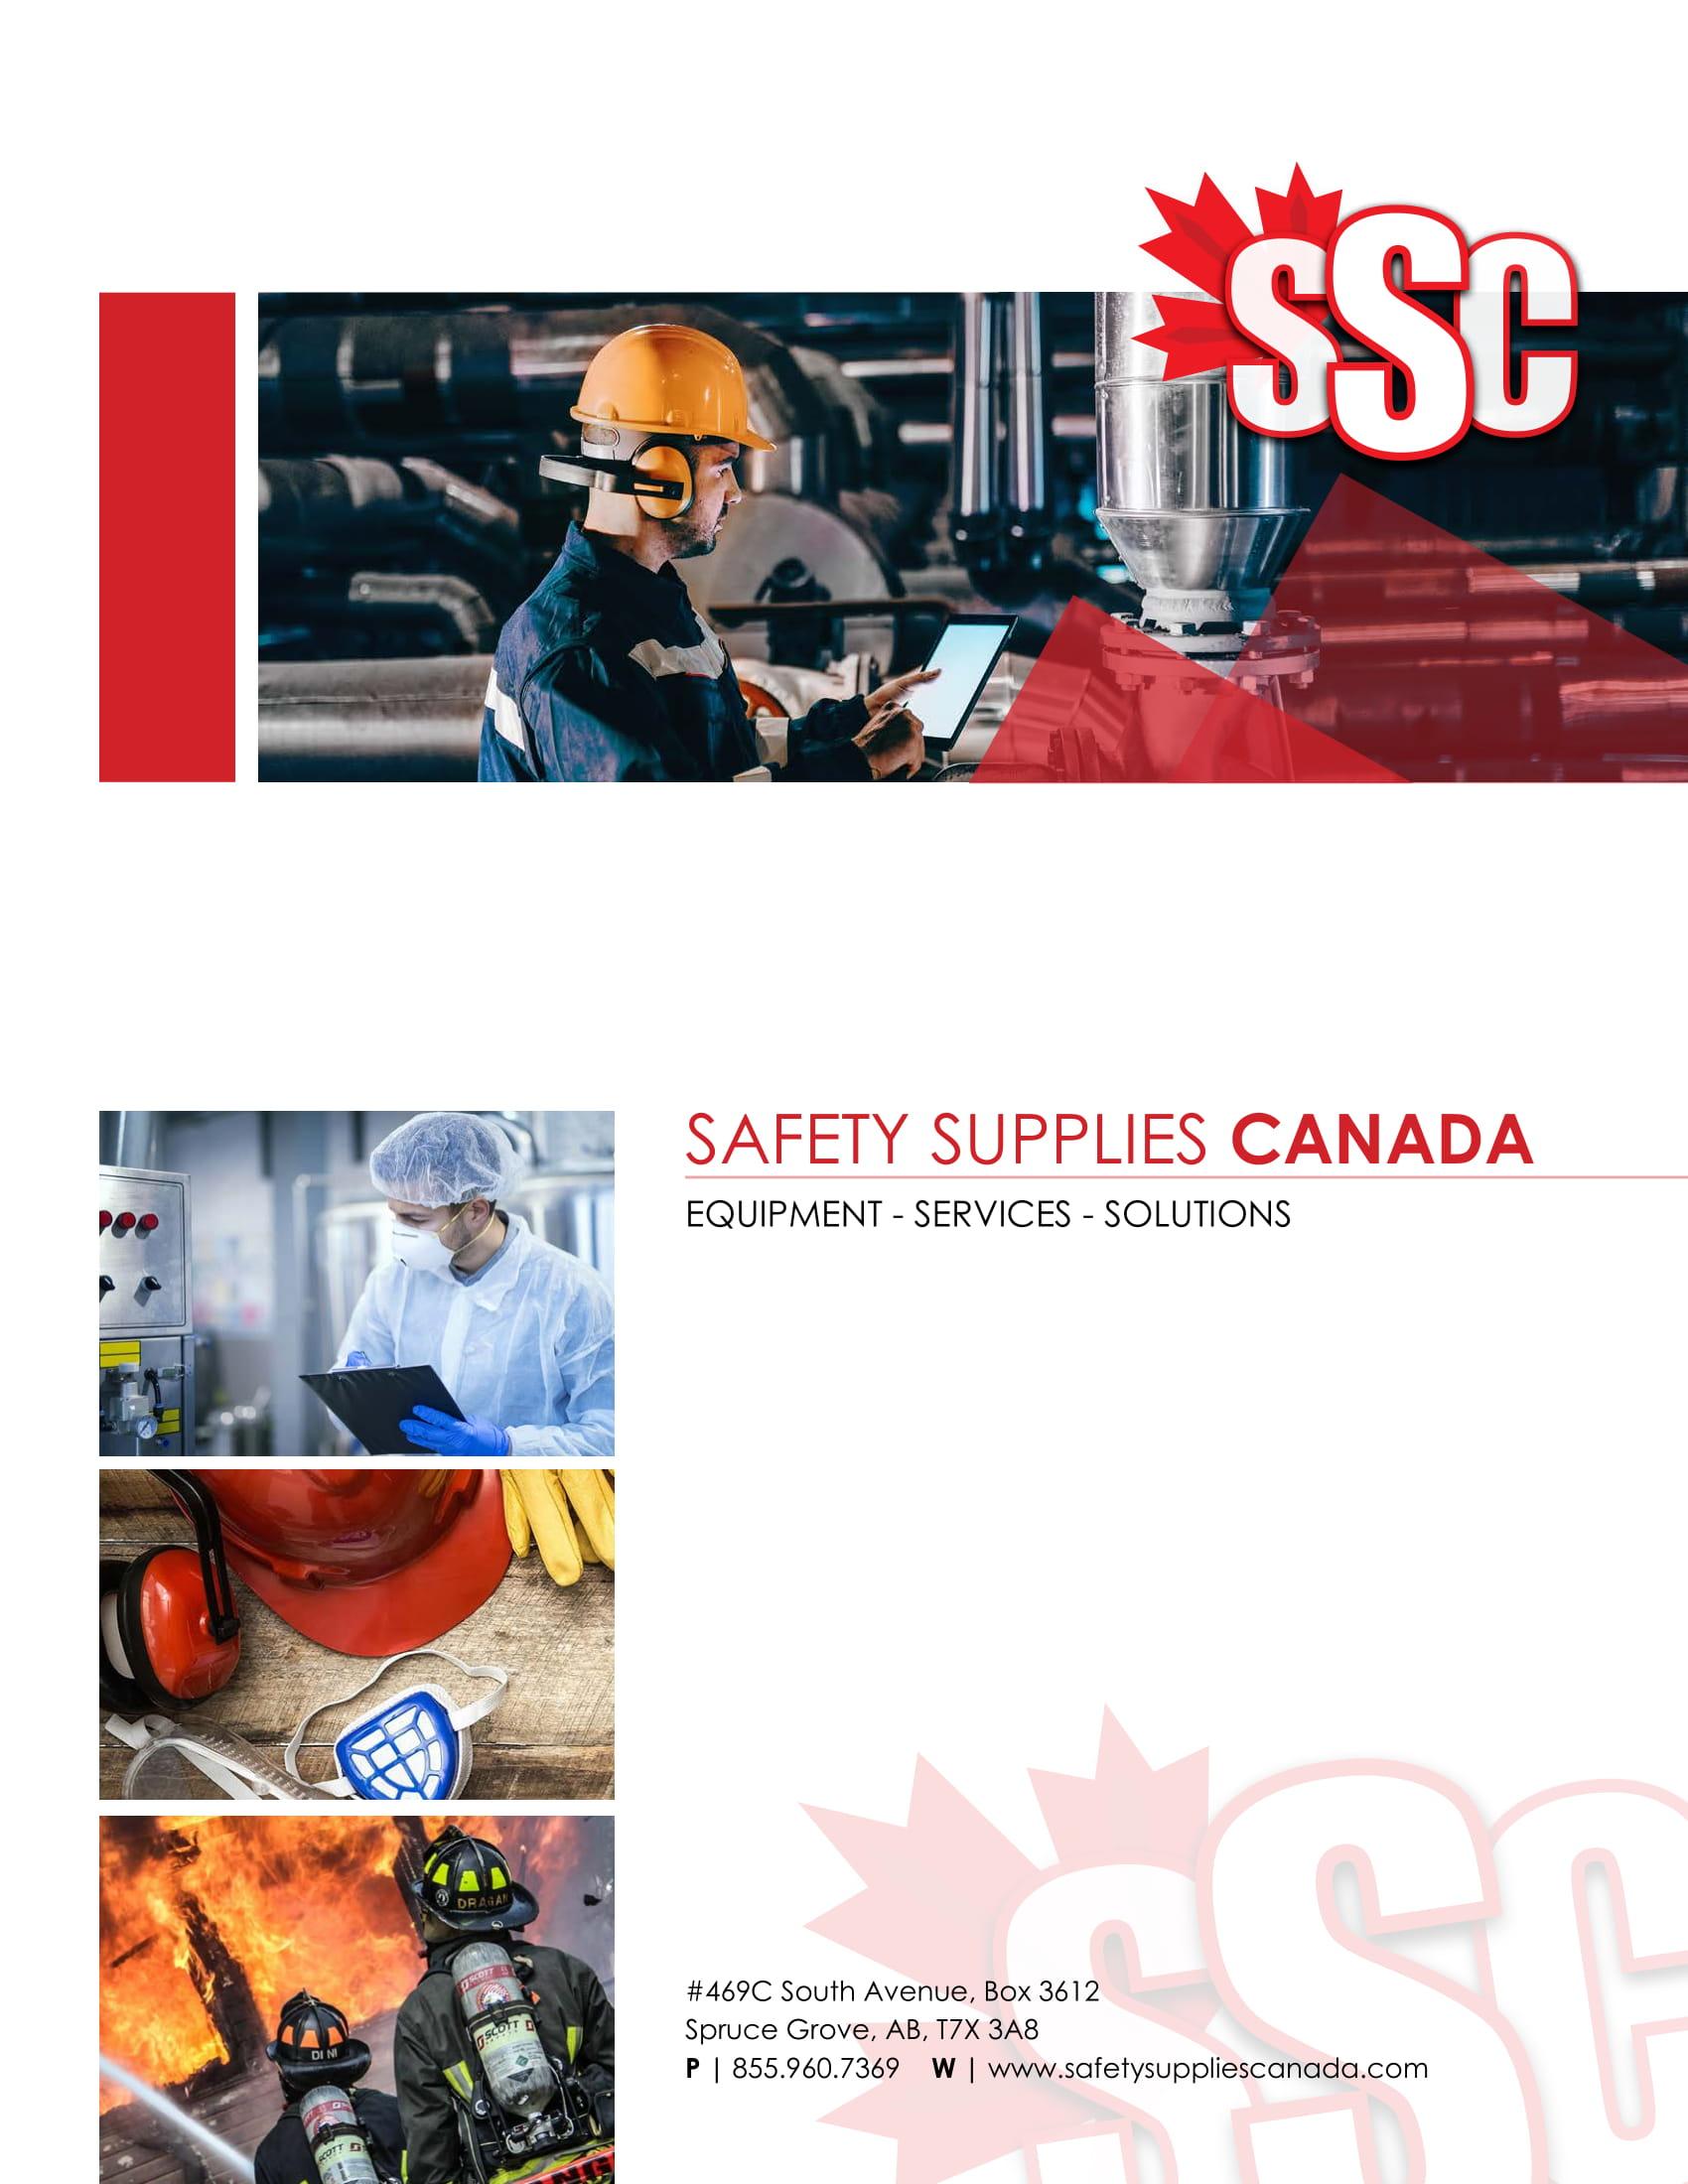 ssc-company-profile-09.29.18-web-1.jpg